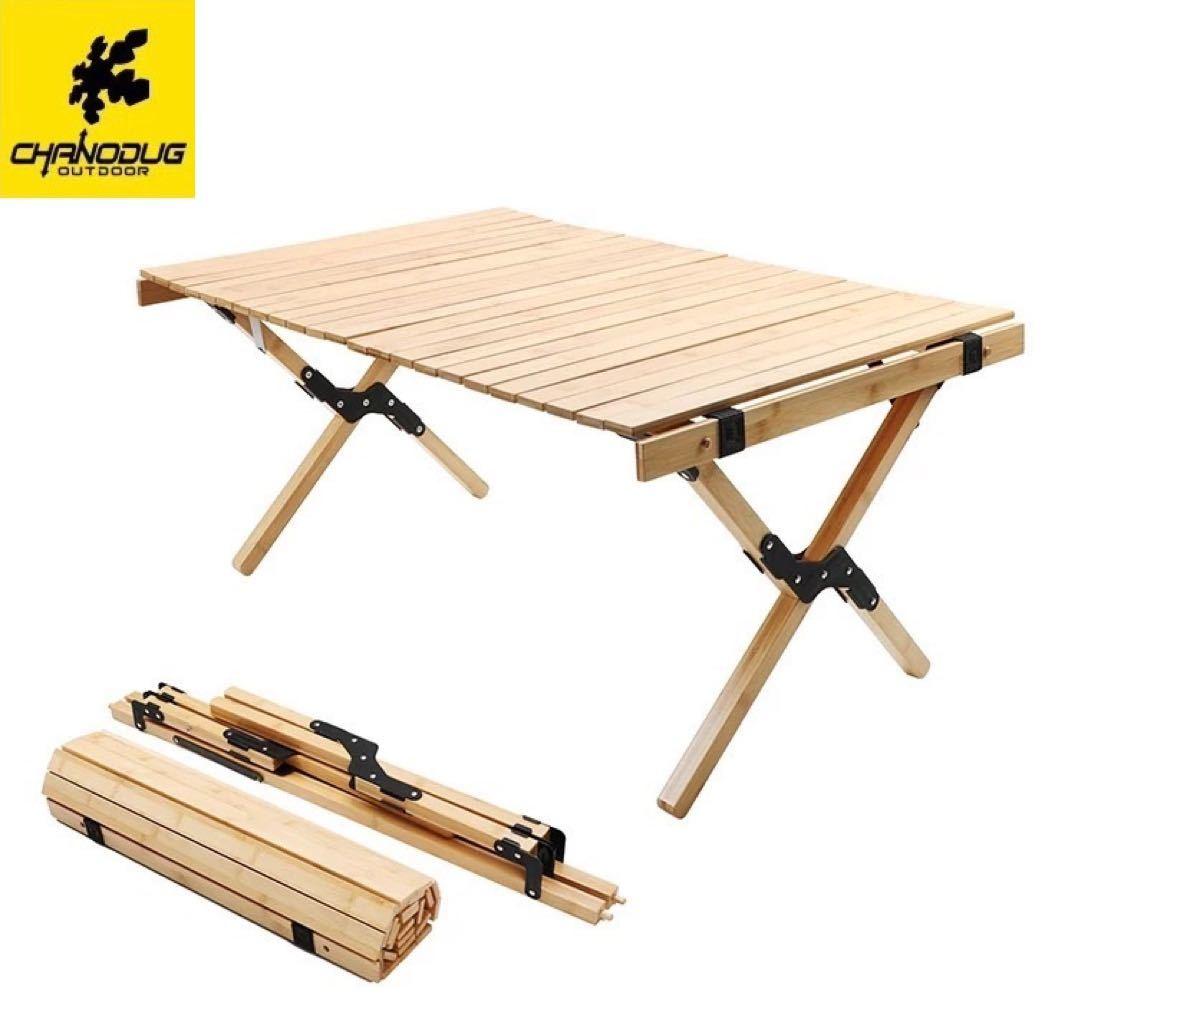 CHANODUG ウッドロールテーブル ケース付 キャンプテーブル ローテーブル